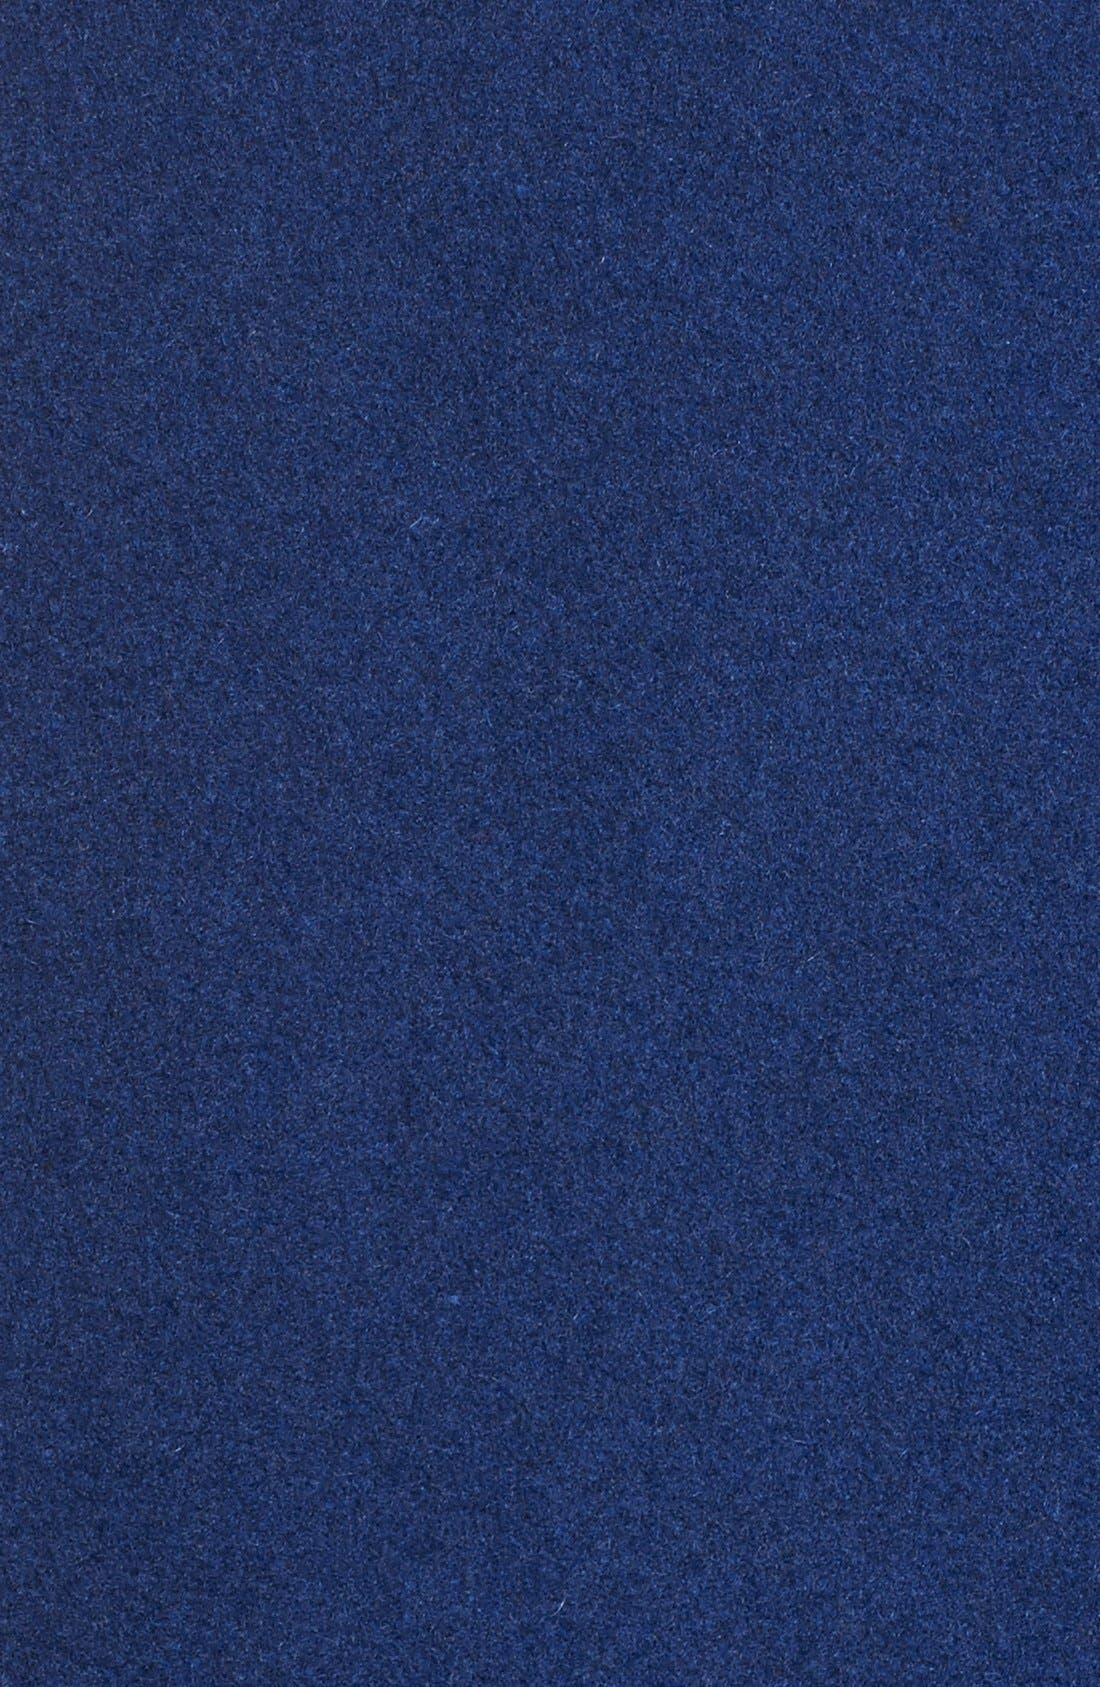 Wool Blend A-Line BabydollCoat,                             Alternate thumbnail 5, color,                             Sapphire